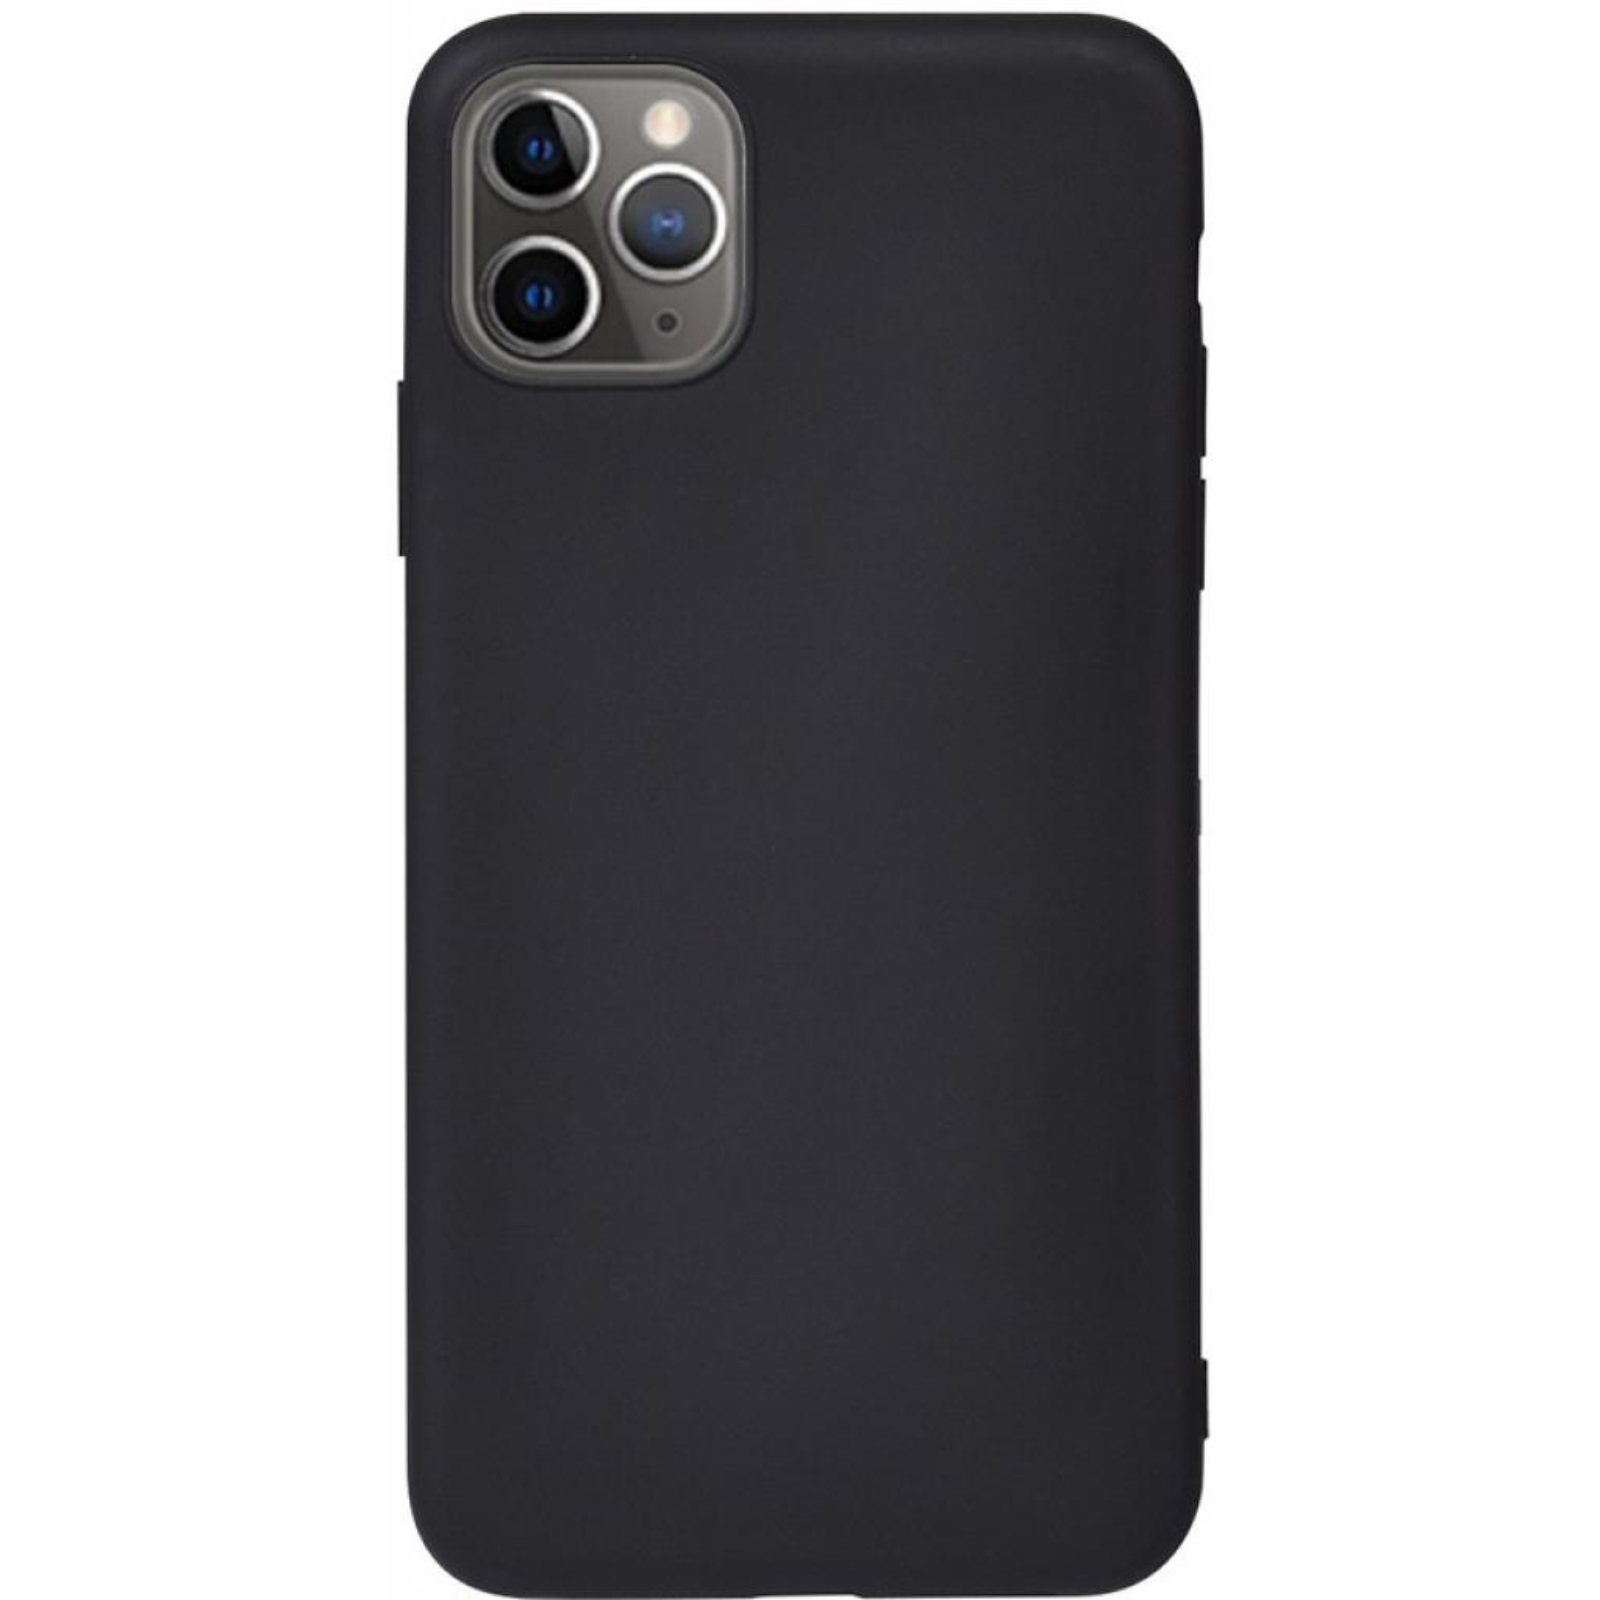 Чехол для моб. телефона Toto 1mm Matt TPU Case Apple iPhone 11 Pro Black (F_102352)